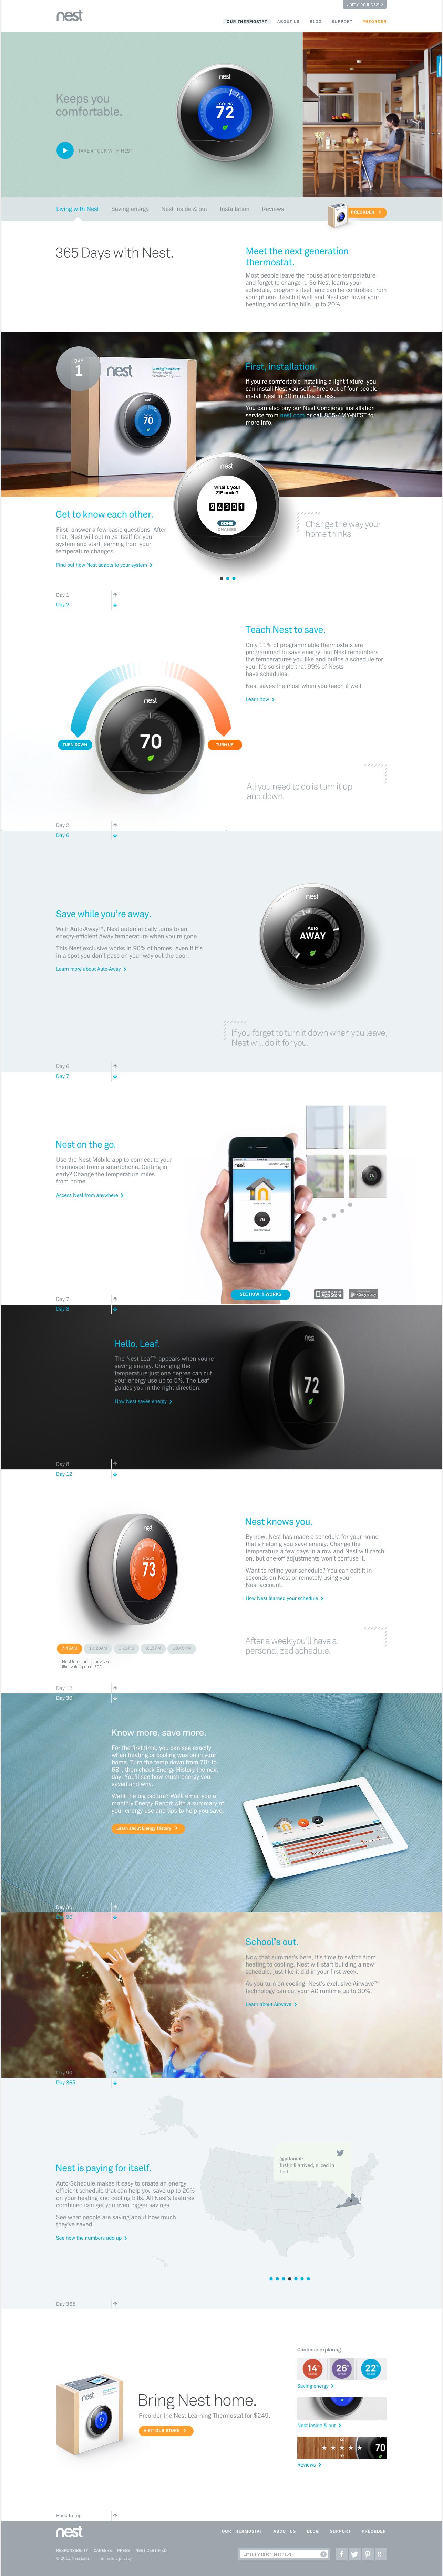 Nest - living with Nest   WEB   Pinterest   Nest, Ui ux and Site design